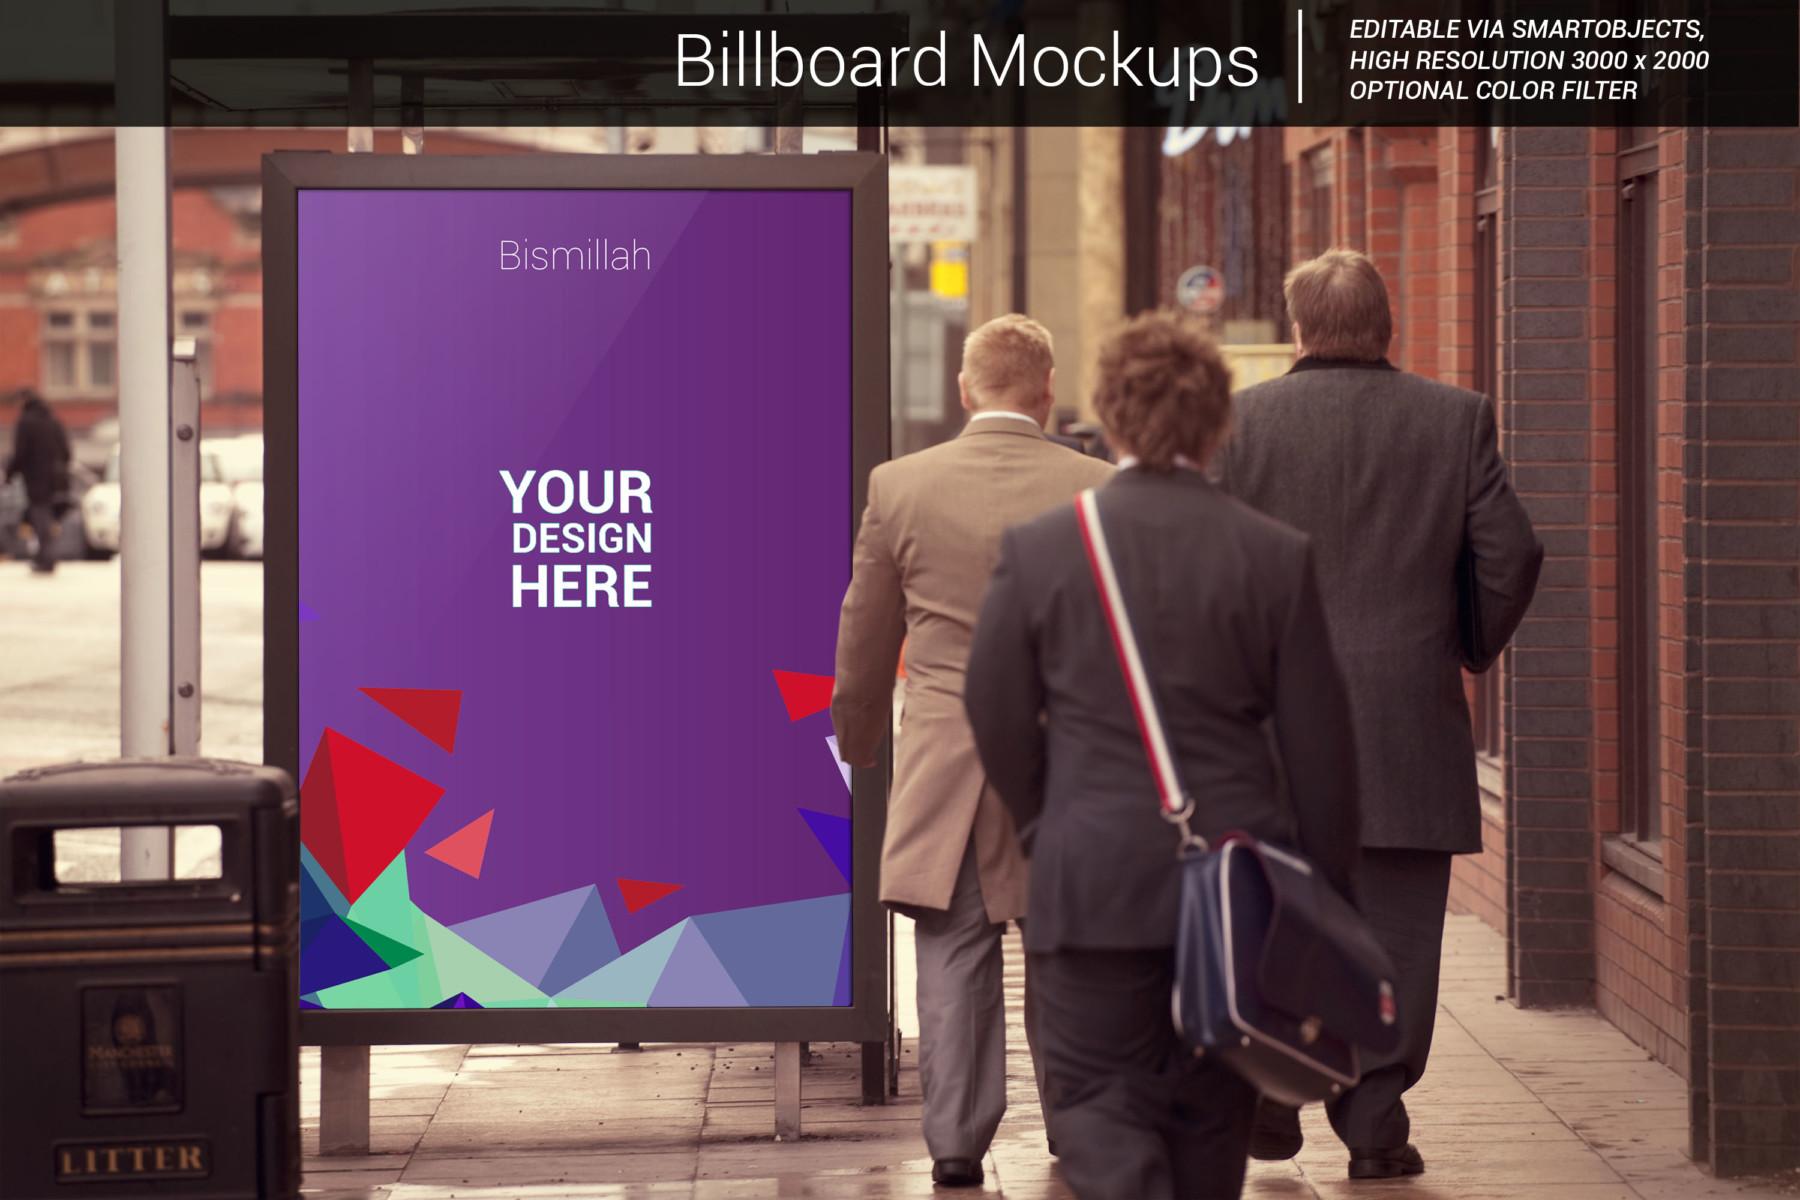 telephone-booth-branding-mockup-outdoor-signage-mockup-signage-mockup-free